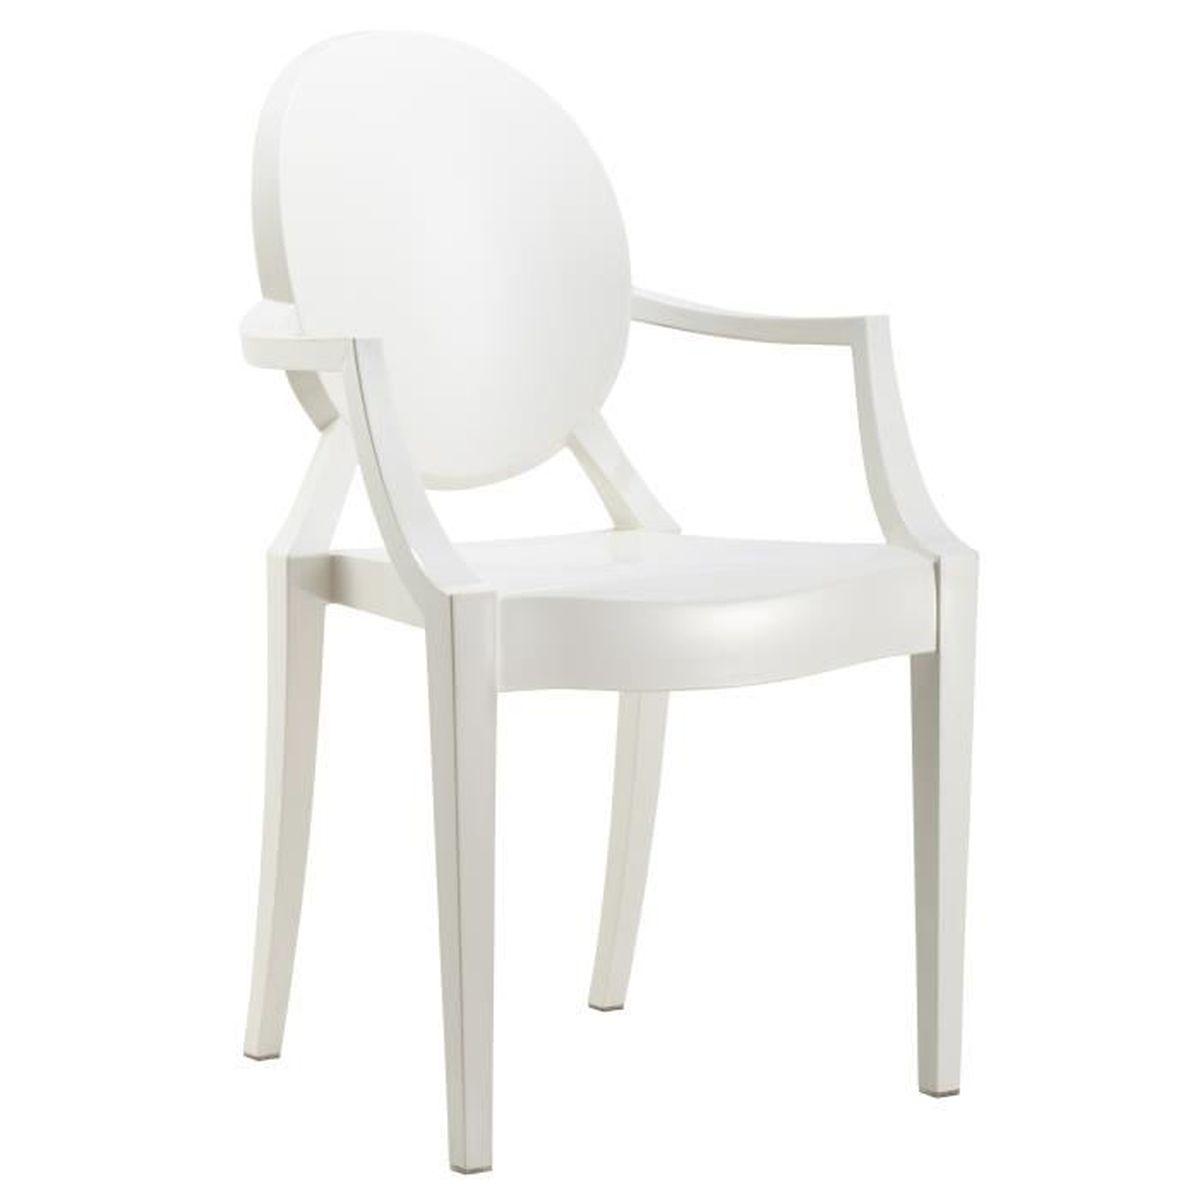 chaise avec accoudoirs design ghost coloris blanc blanc achat vente chaise cdiscount. Black Bedroom Furniture Sets. Home Design Ideas